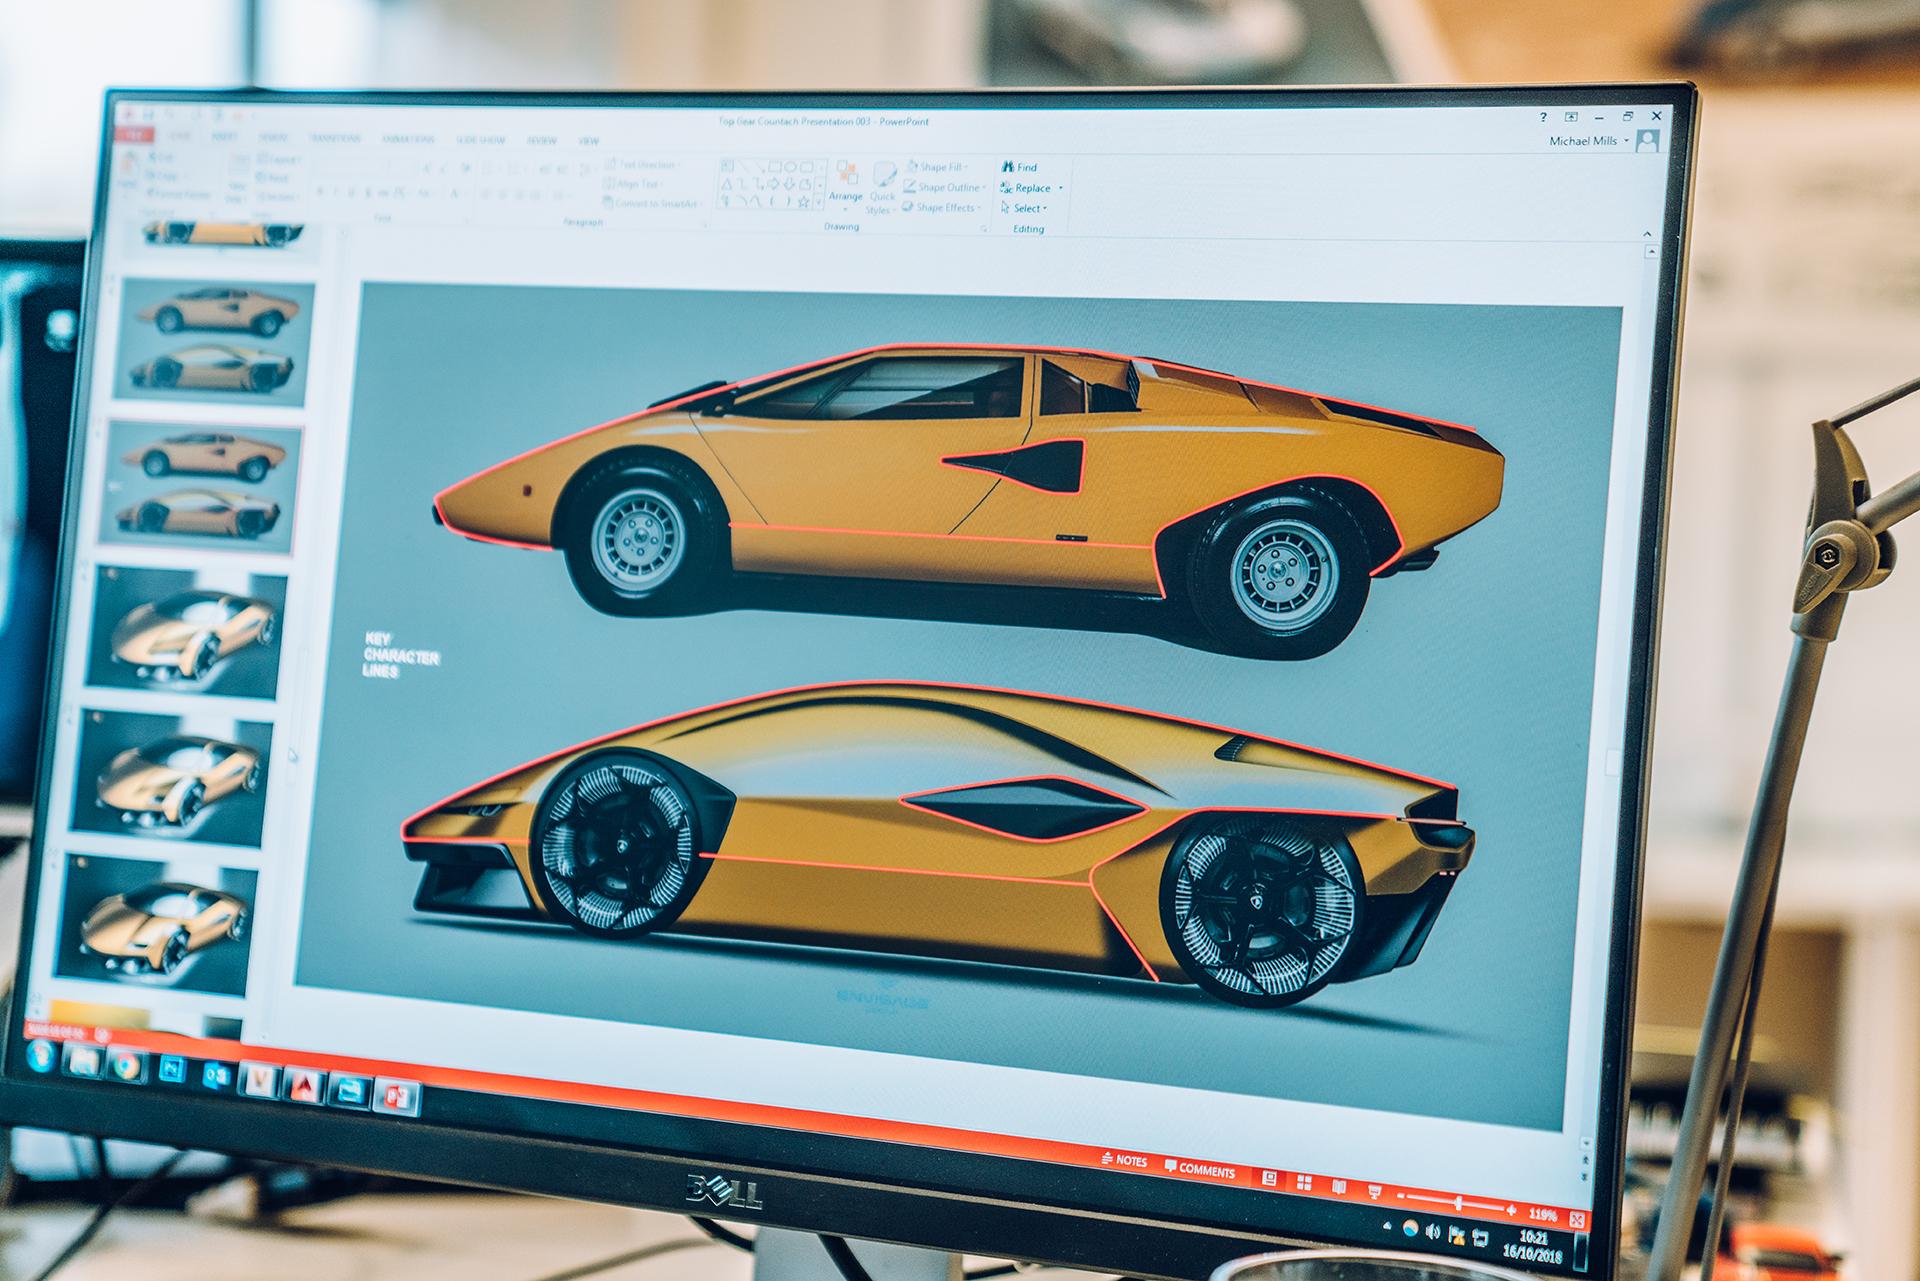 Geschiedenis van Lamborghini - Countach design